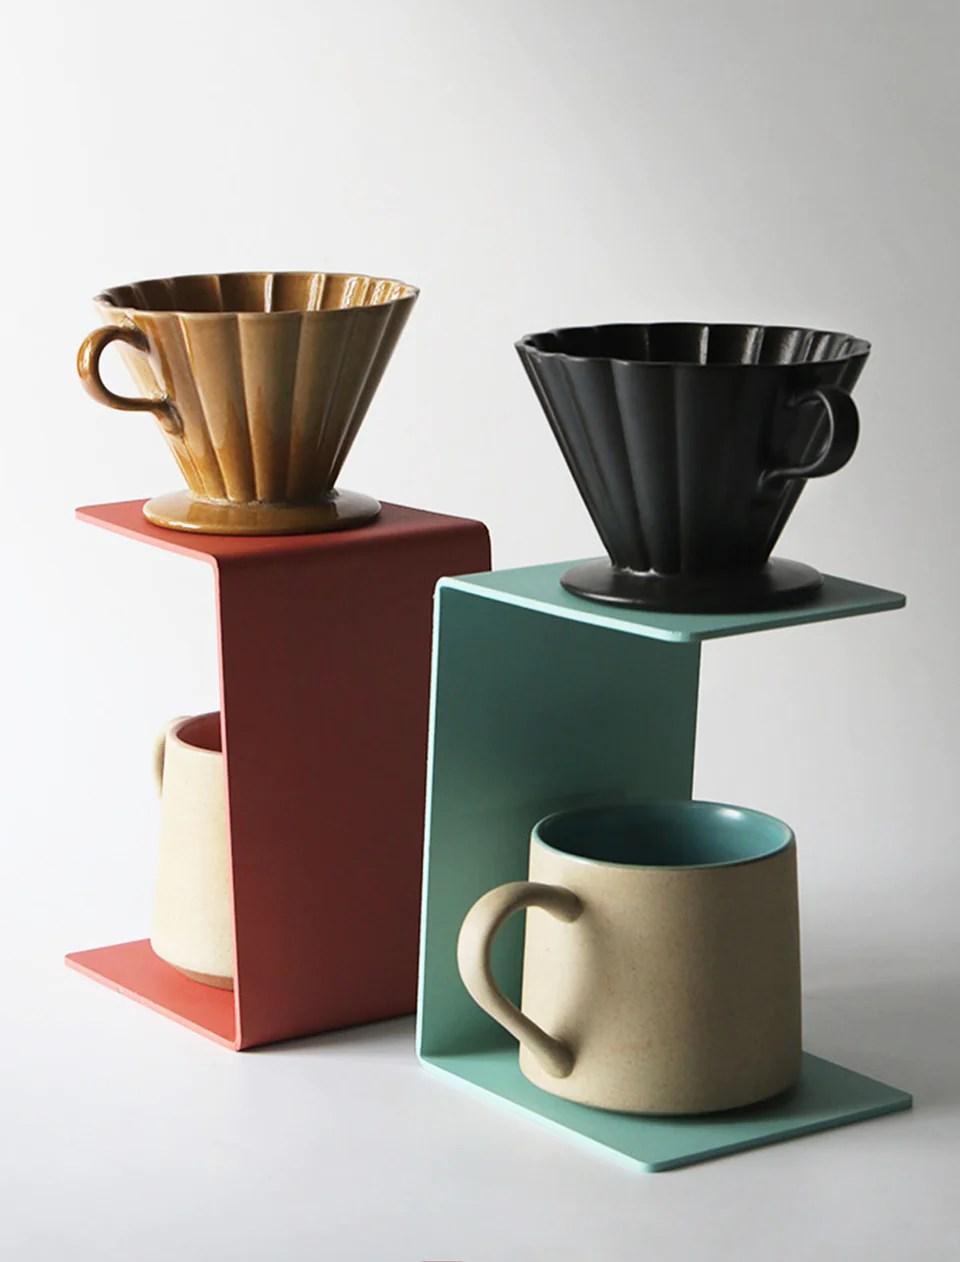 handmade modern pour over